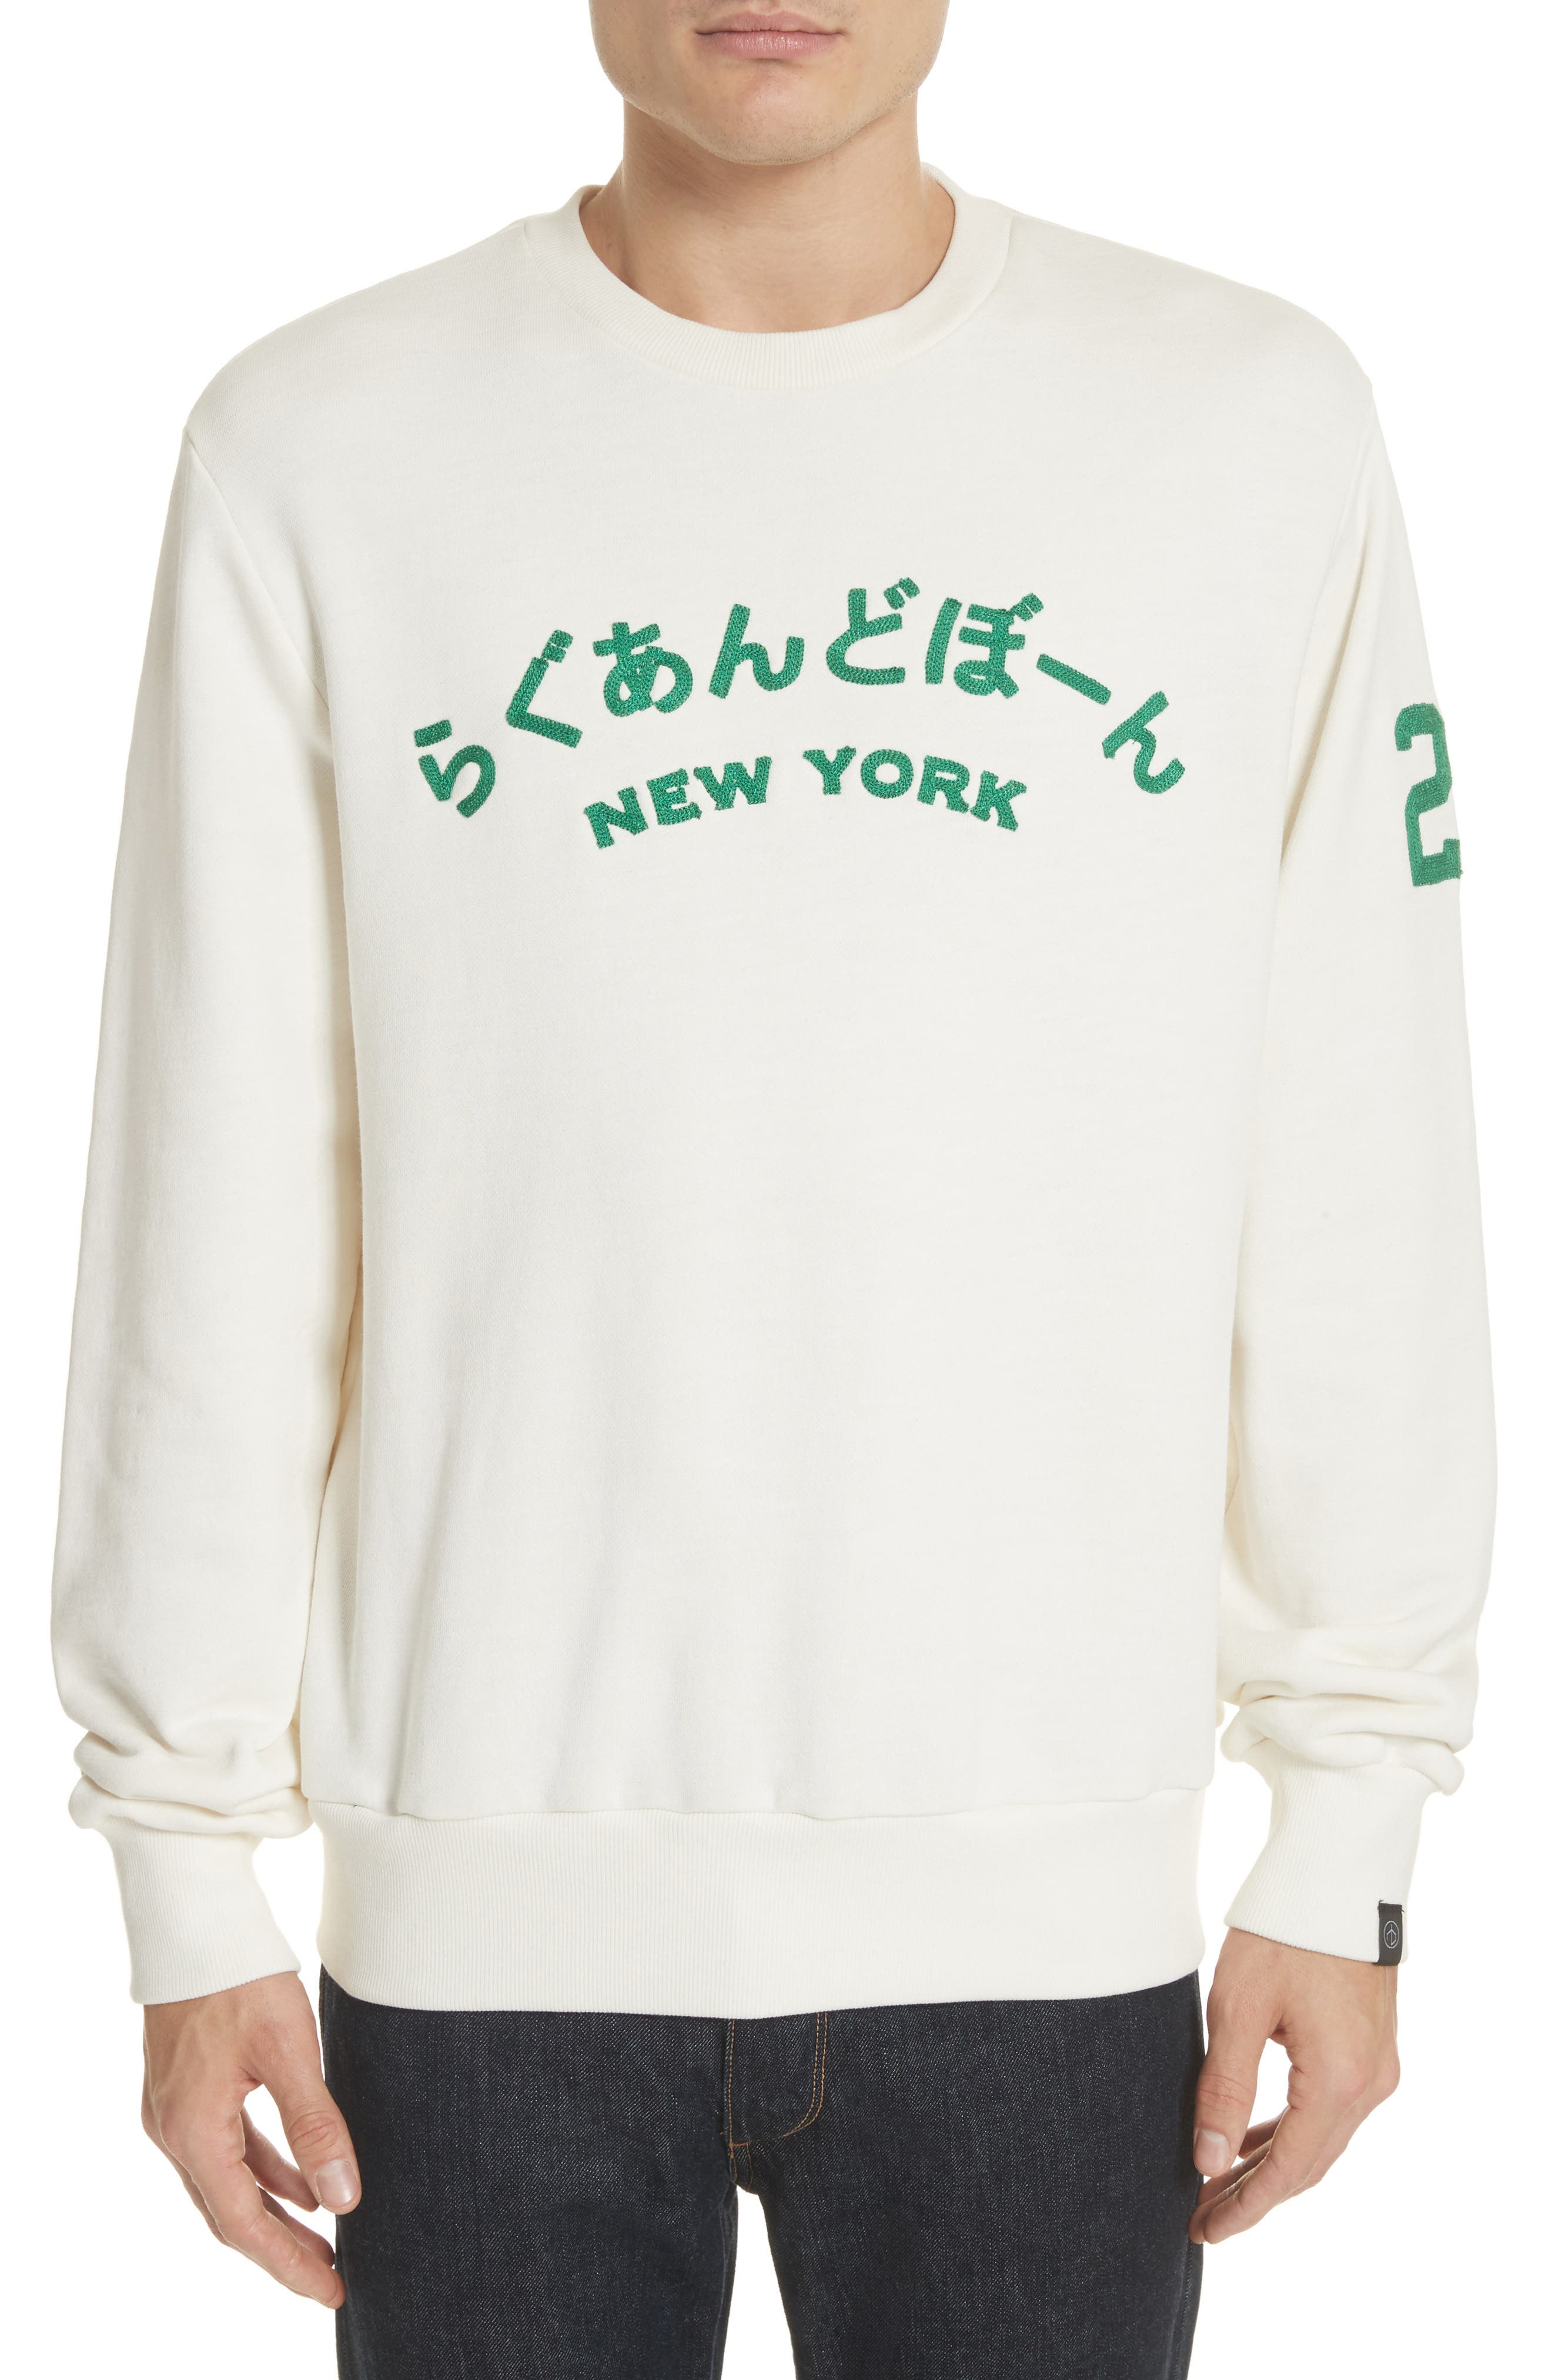 Japan Embroidered Crewneck Sweatshirt,                         Main,                         color, 900